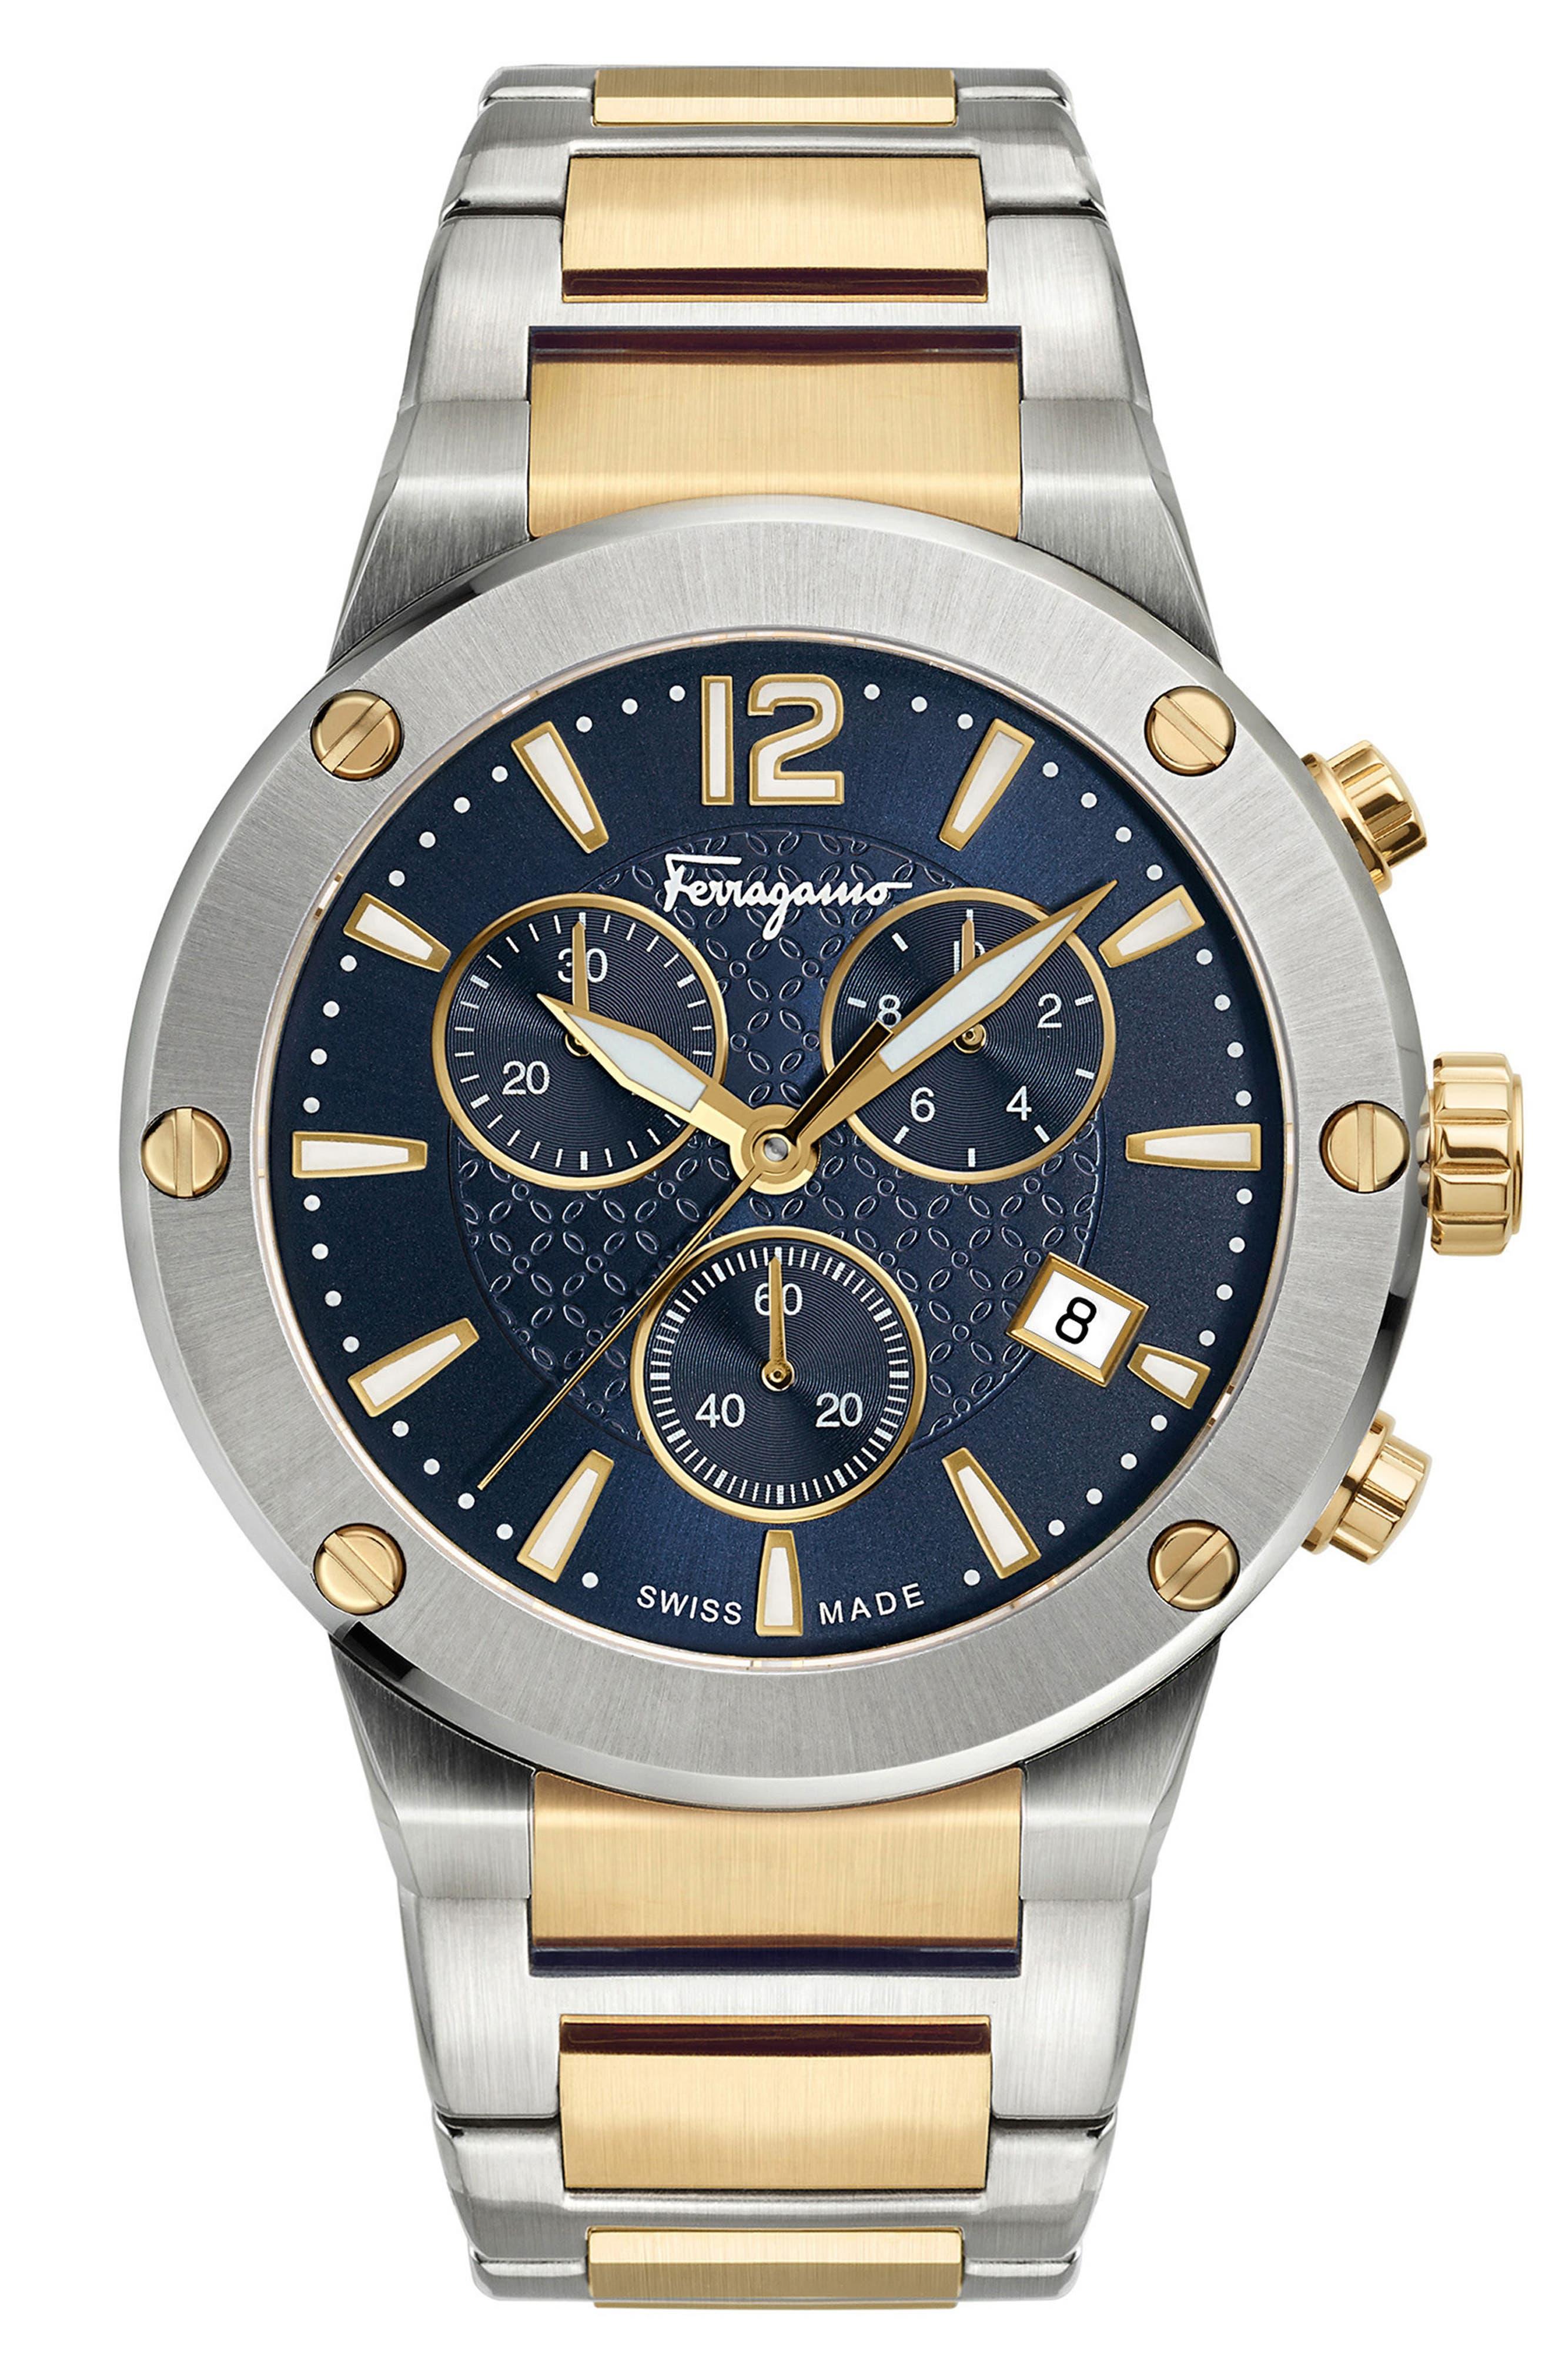 Main Image - Salvatore Ferragamo F-80 Chronograph Bracelet Watch, 44mm